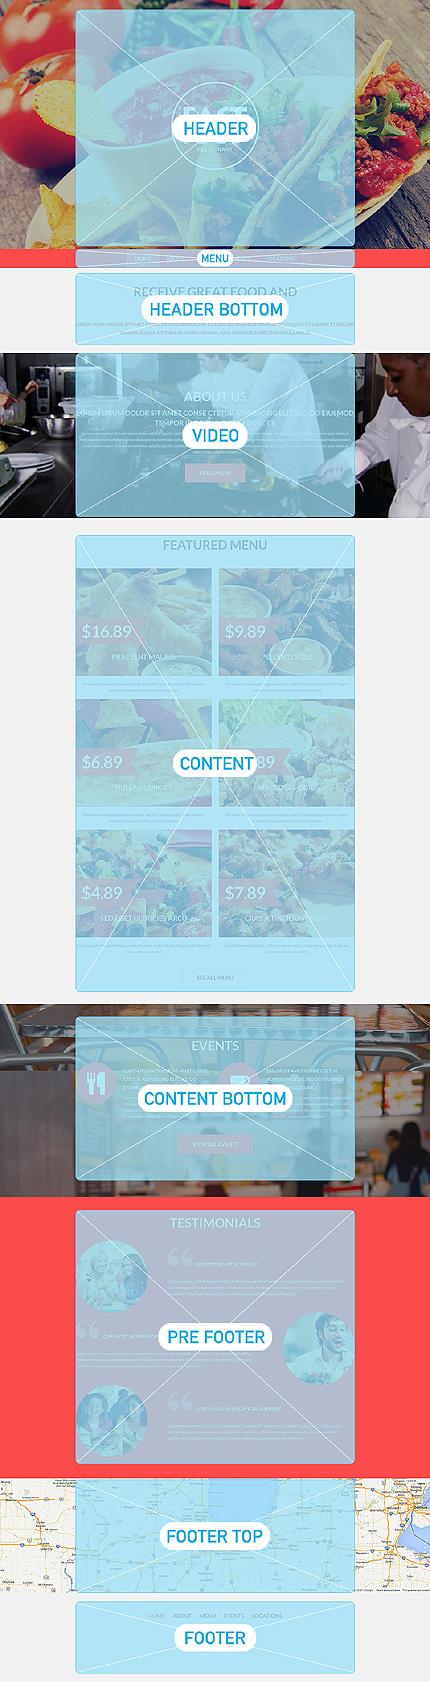 Drupal Template 51203 Main Page Screenshot